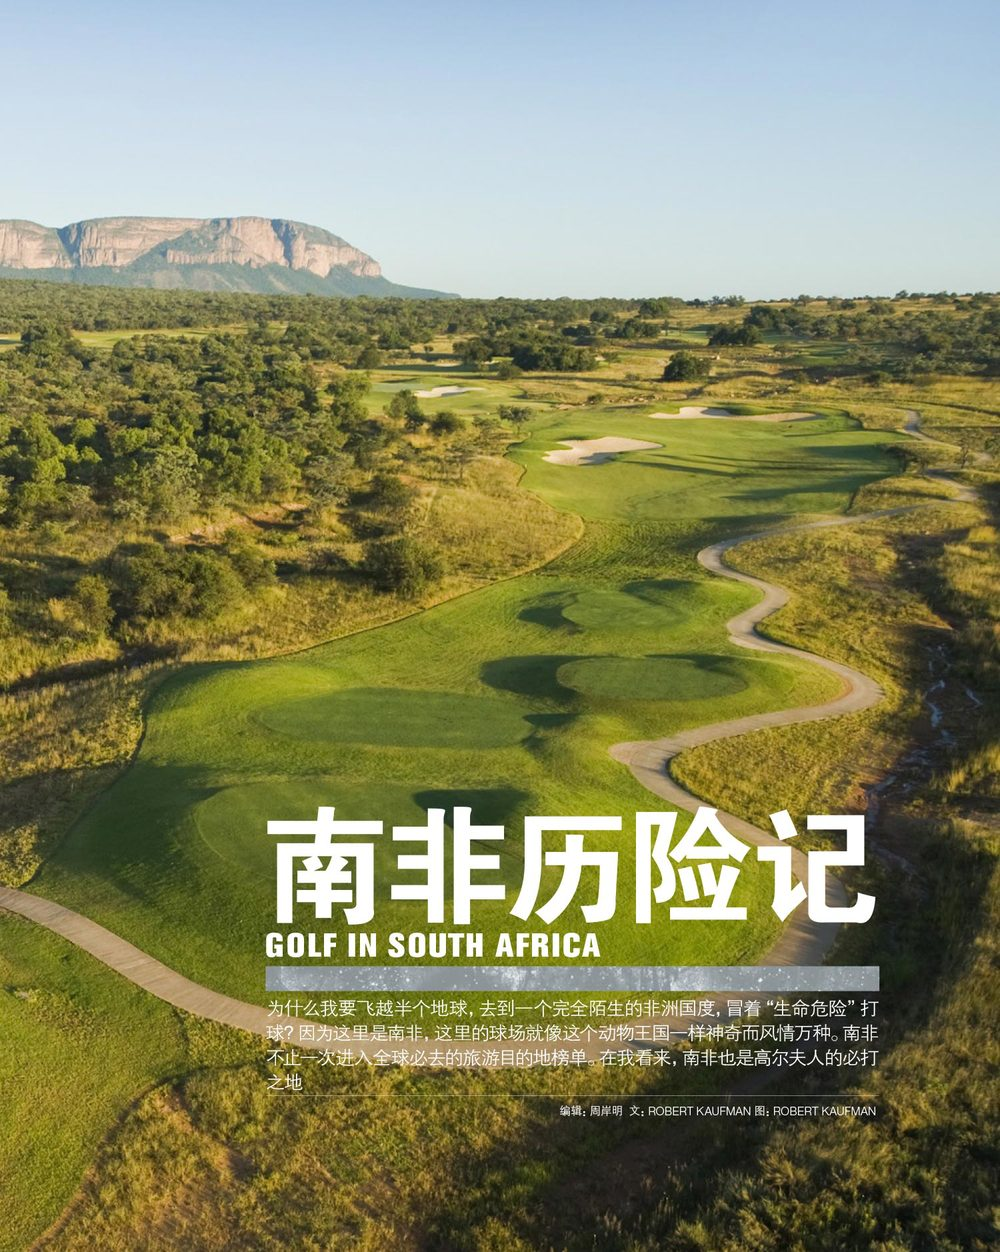 SouhAfrica-Golf.jpg